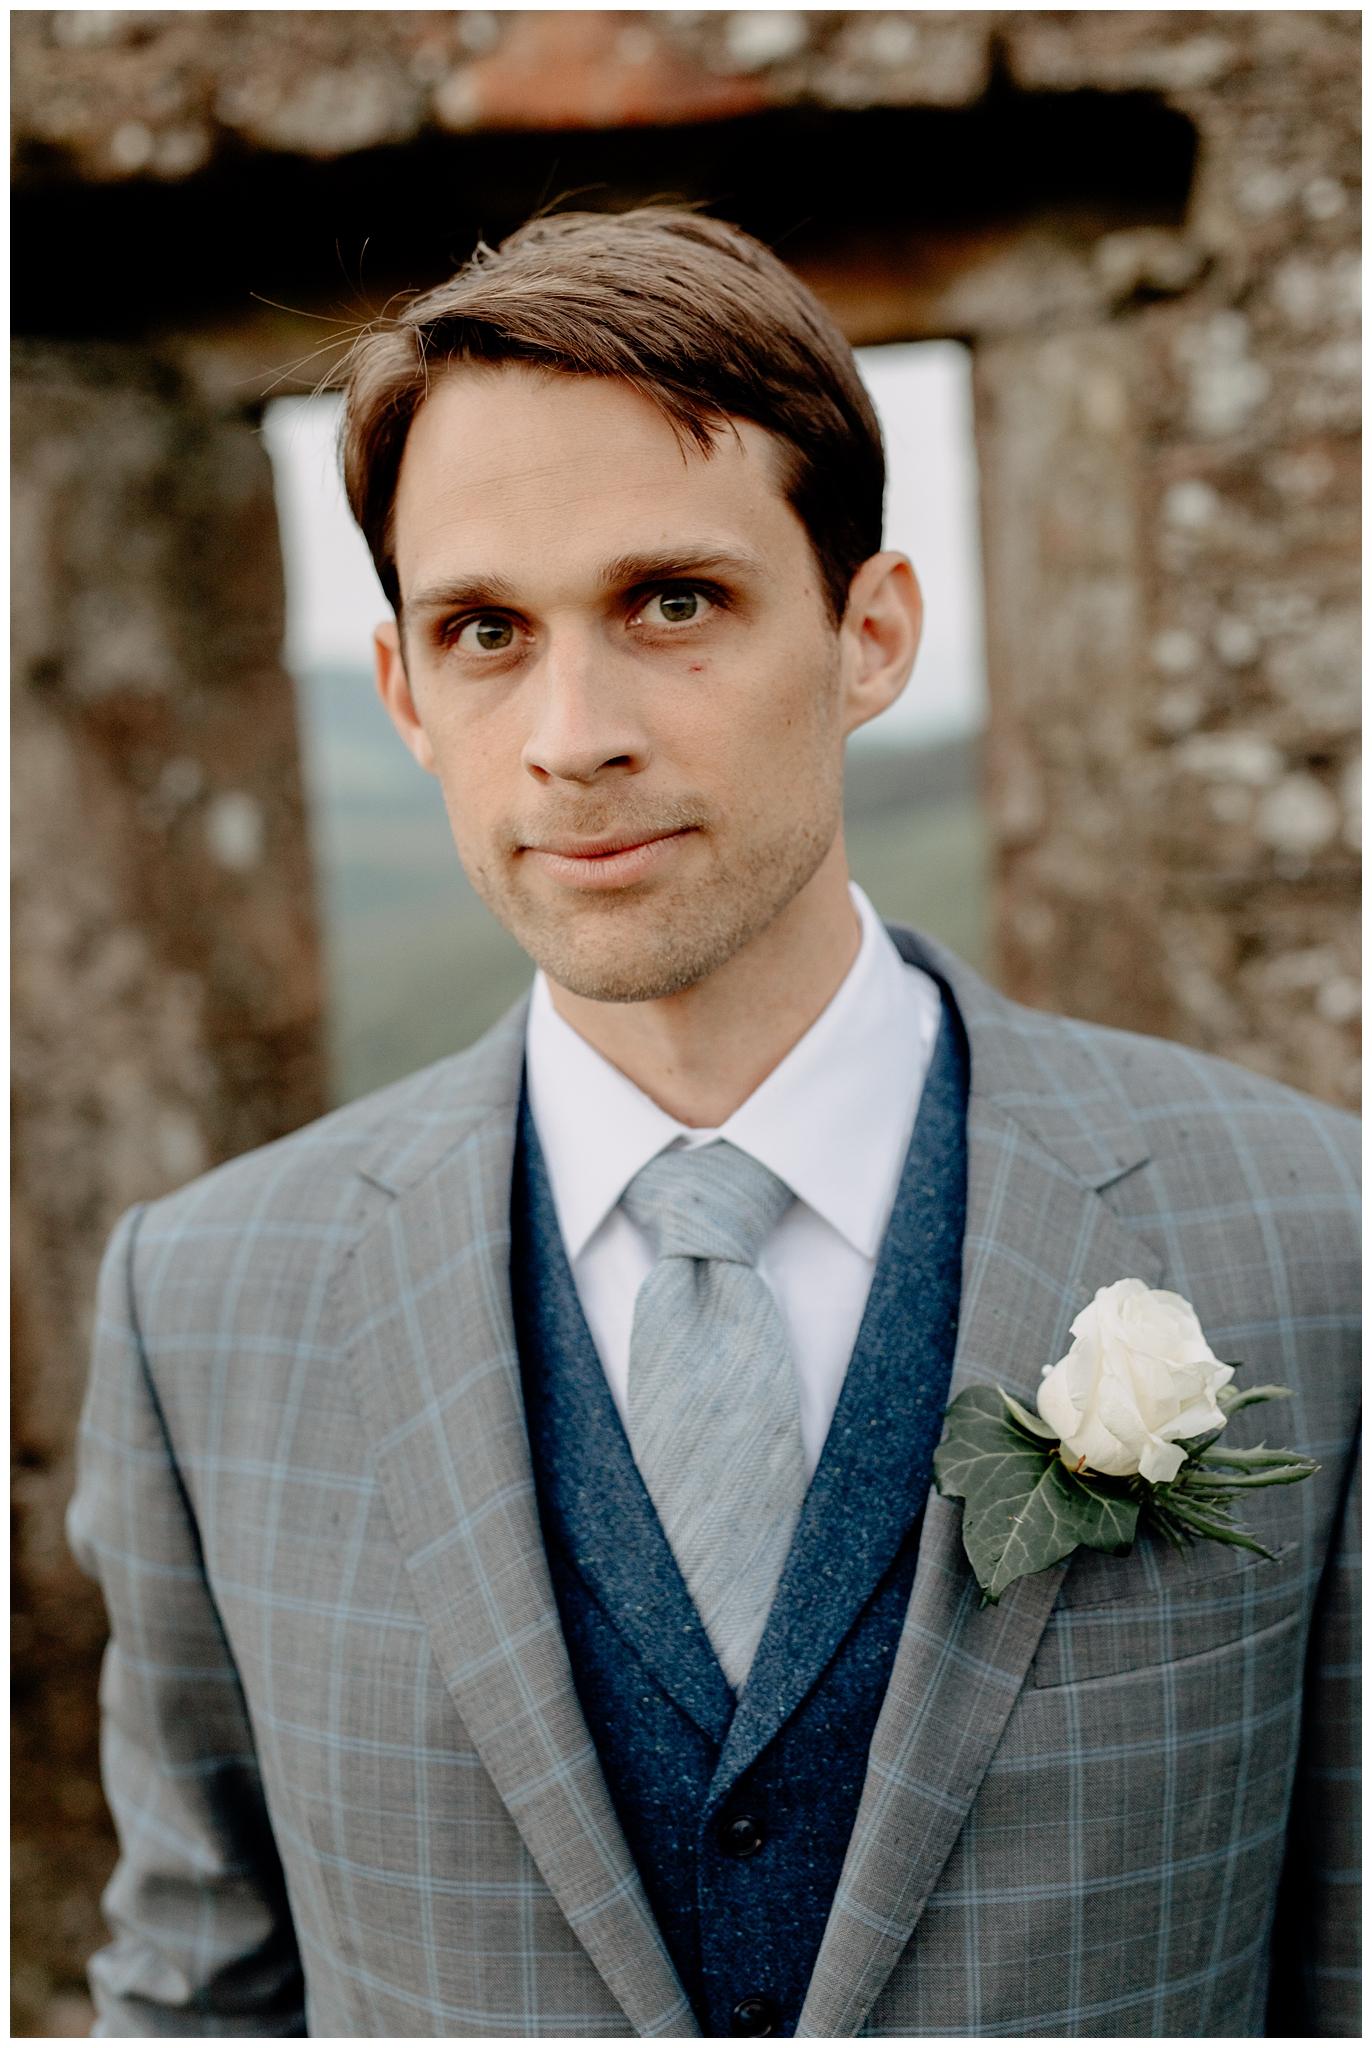 austin-texas-scottish-wedding-bride-groom22008.JPG